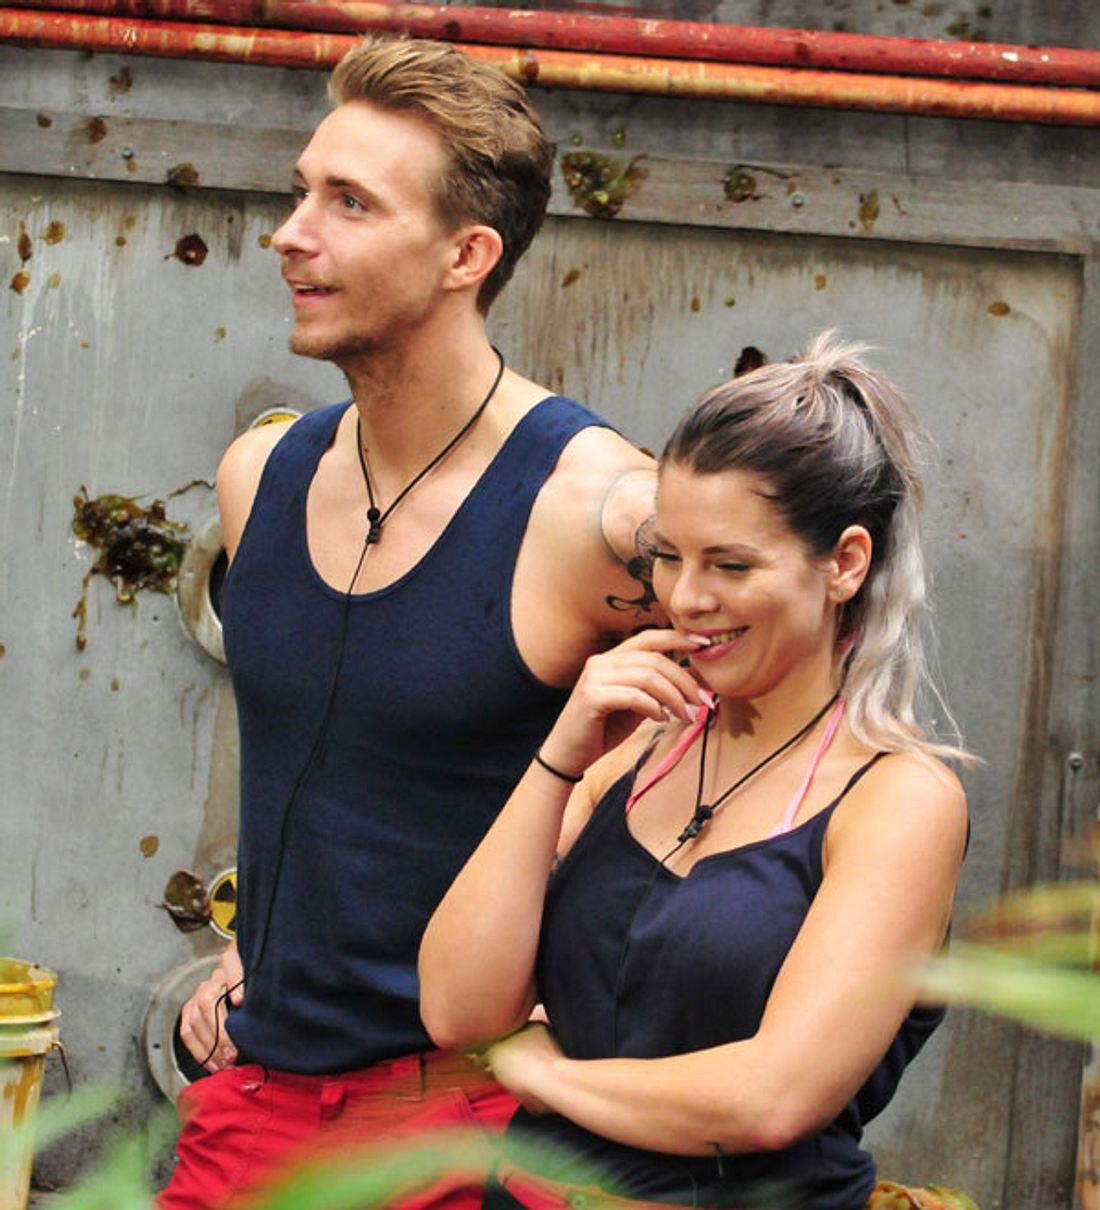 Jenny Frankhauser & David Friedrich: Geheime Dschungelcamp Liebe!